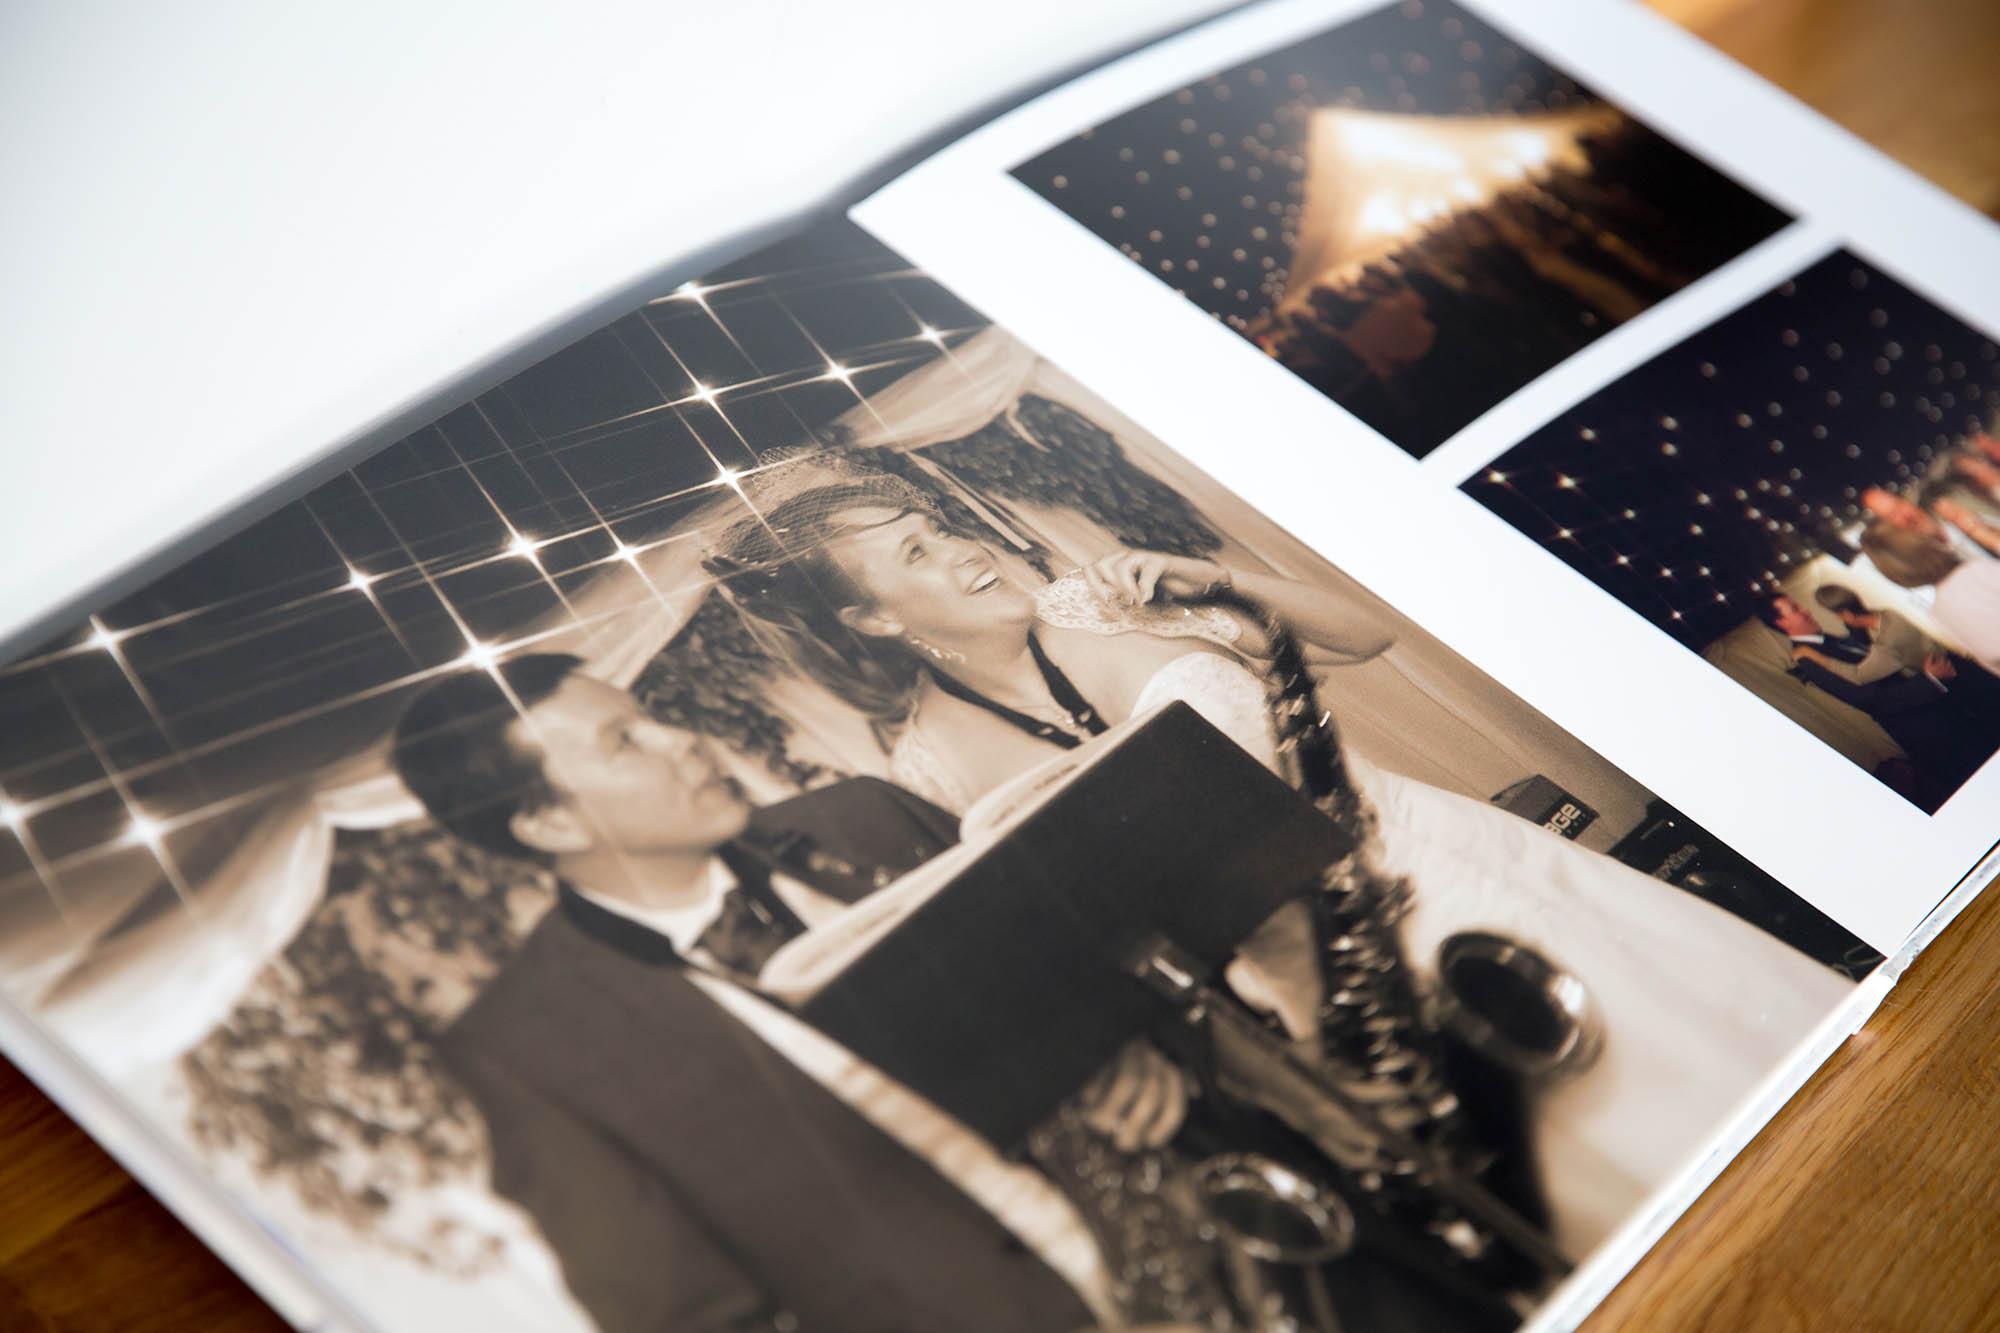 Julia_toms_wedding_album_story_book_044.jpg